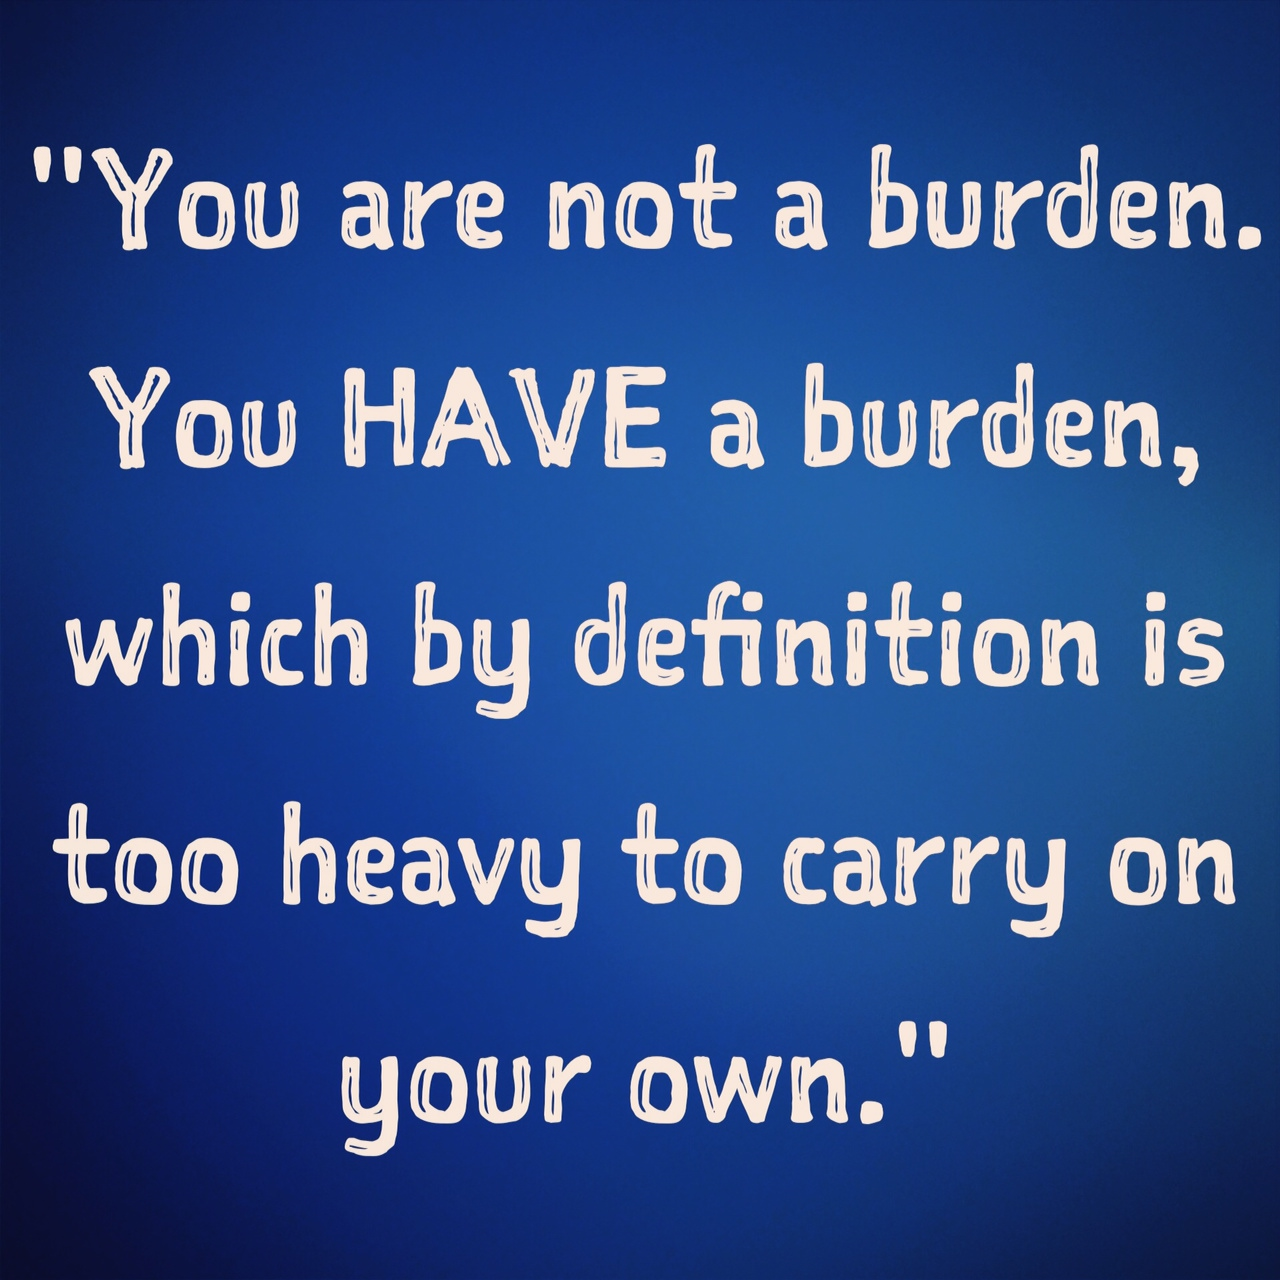 Motivational Inspirational Quotes: Dementia Quotes Inspirational. QuotesGram